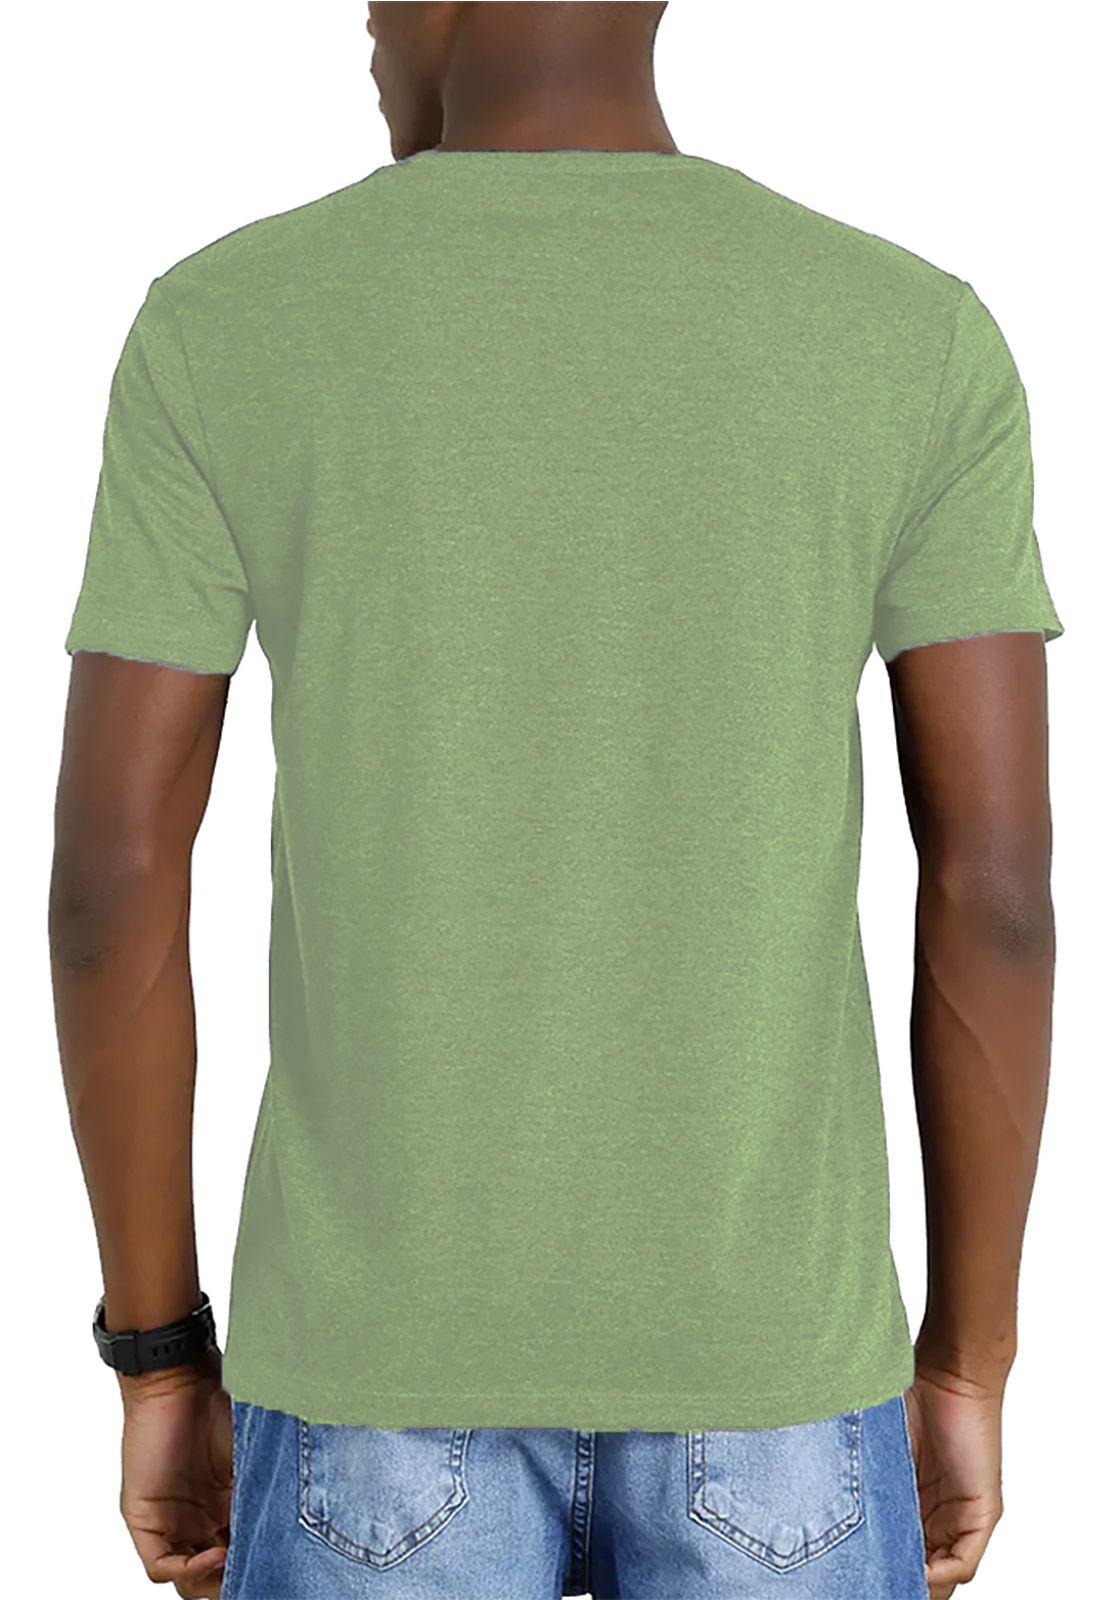 Camiseta Amazônia Garrafa Pet Tucano Asas Abertas - Verde Claro